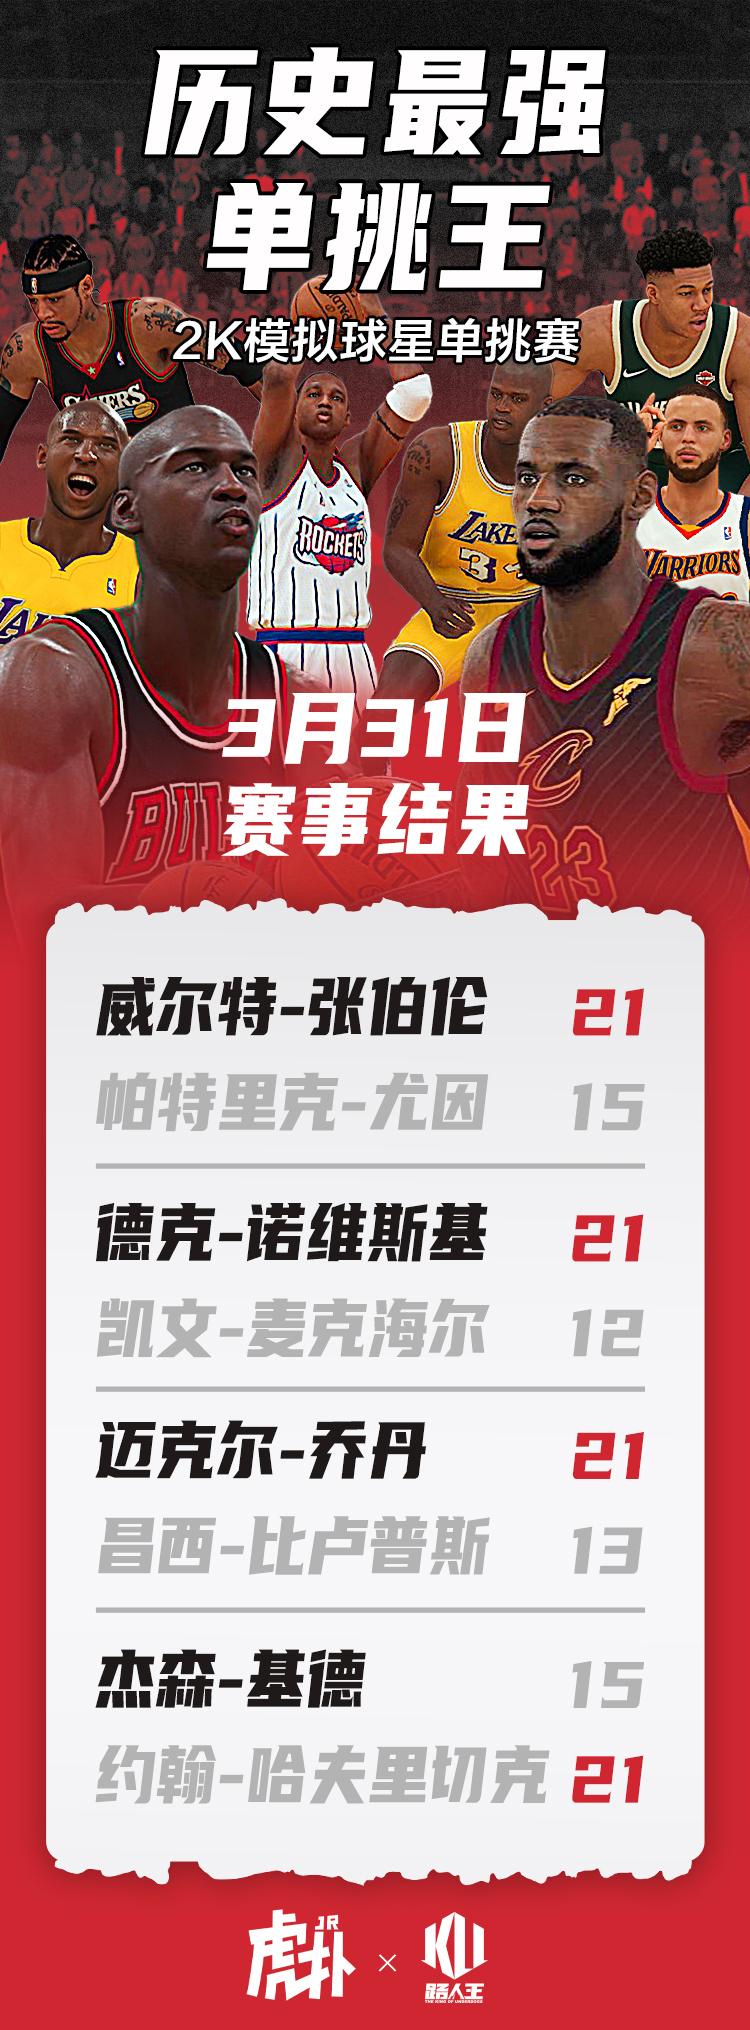 2K单挑赛今日各数据最高:诺维茨基53篮板,张伯伦15盖帽